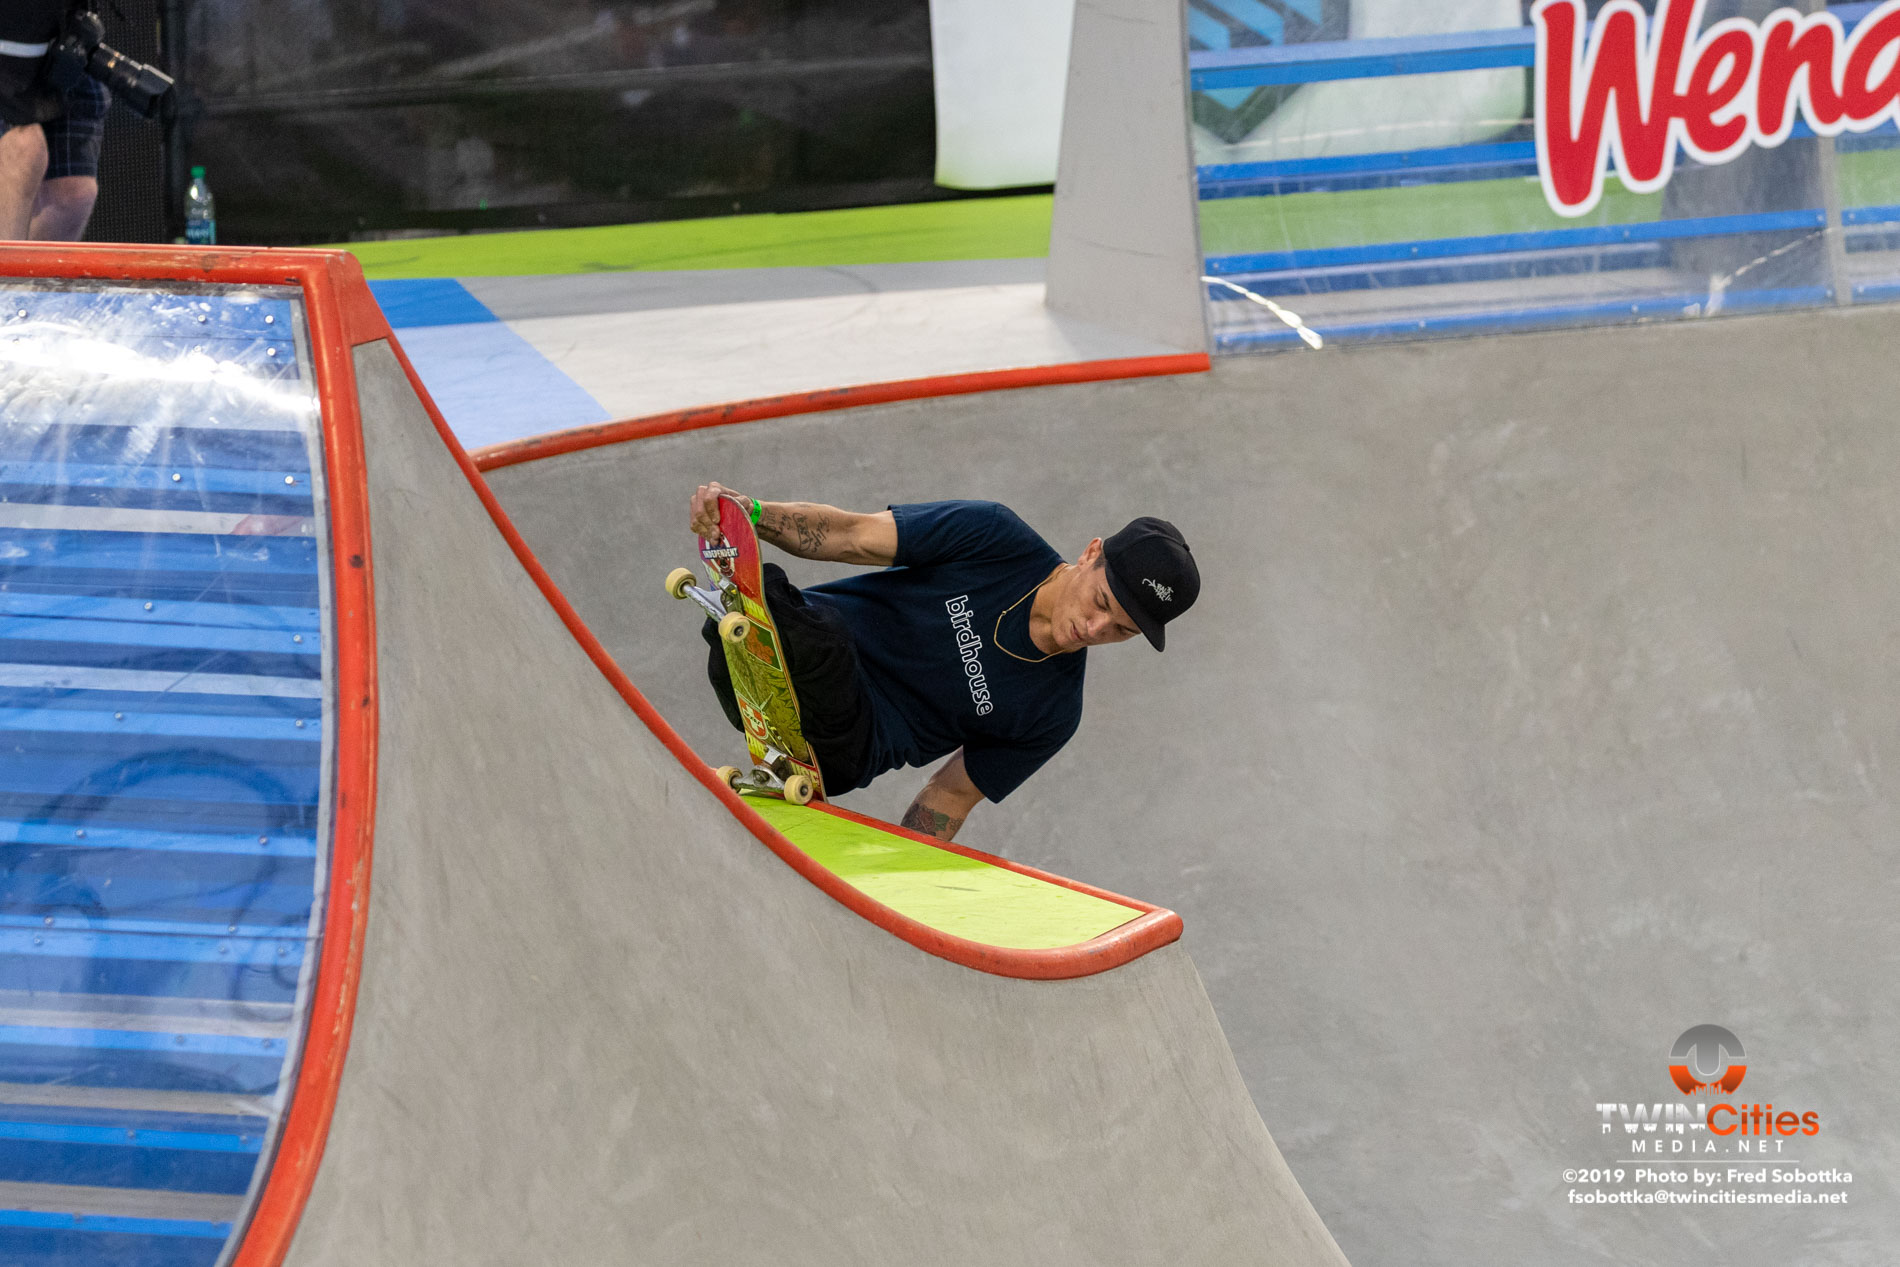 Adaptive-Skateboard-Park-01